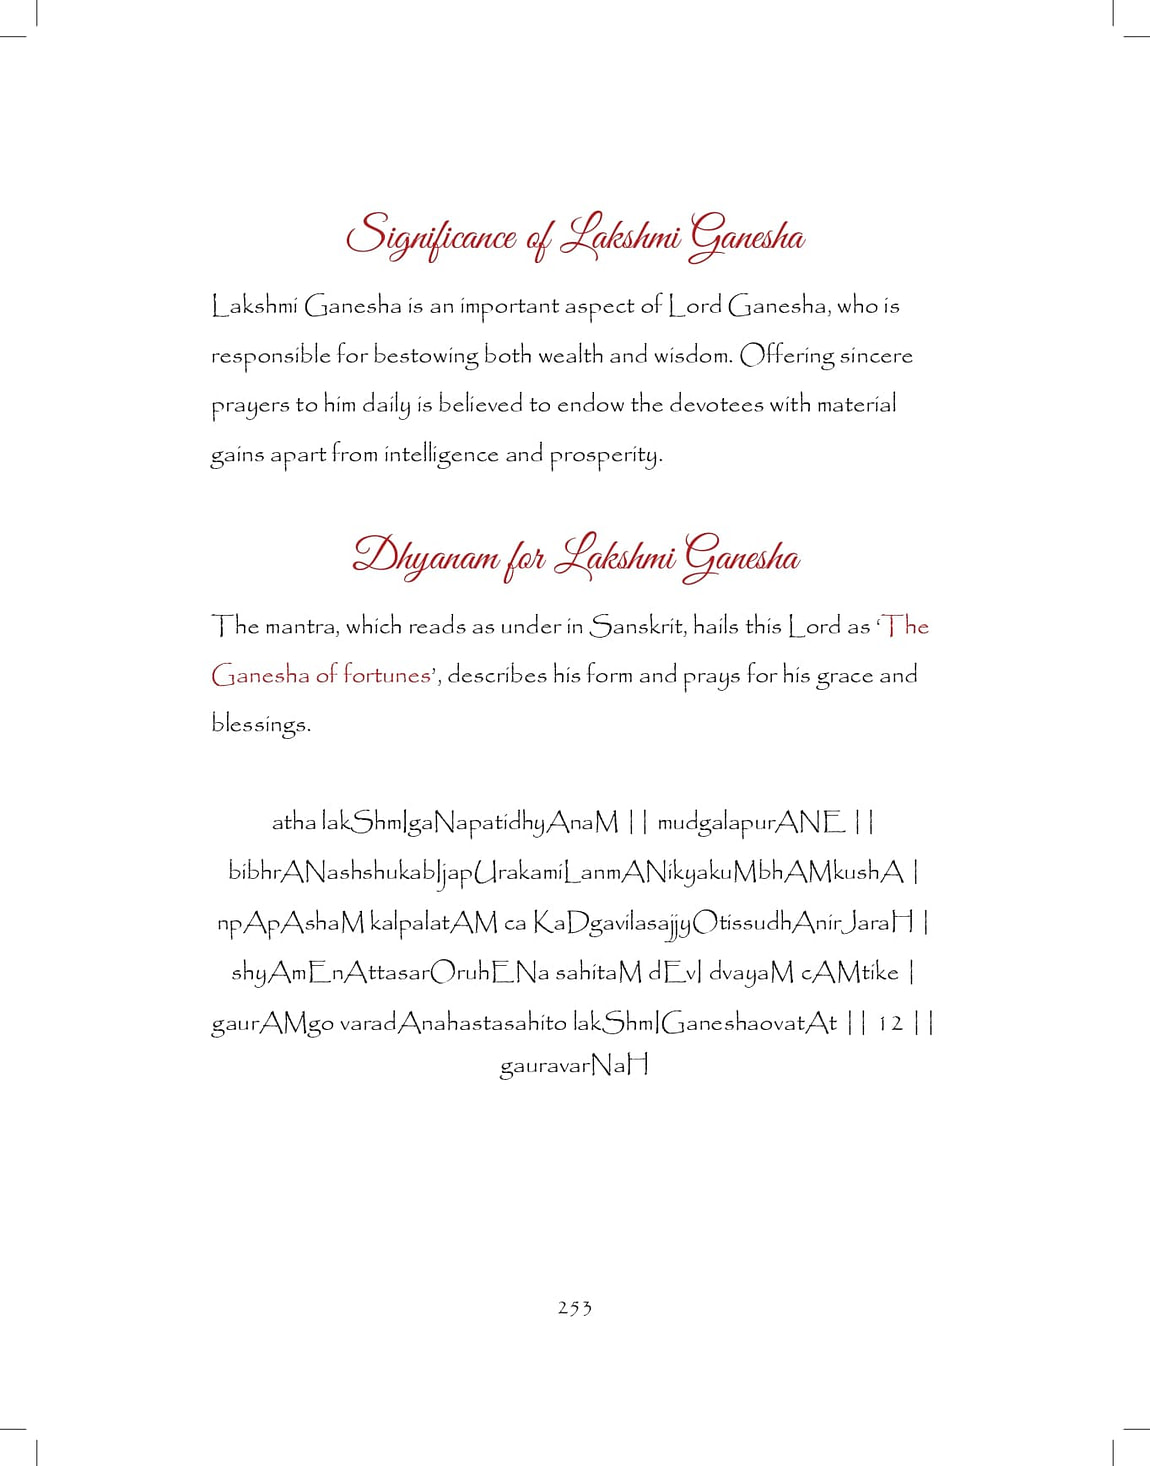 Ganesh-print_pages-to-jpg-0253.jpg